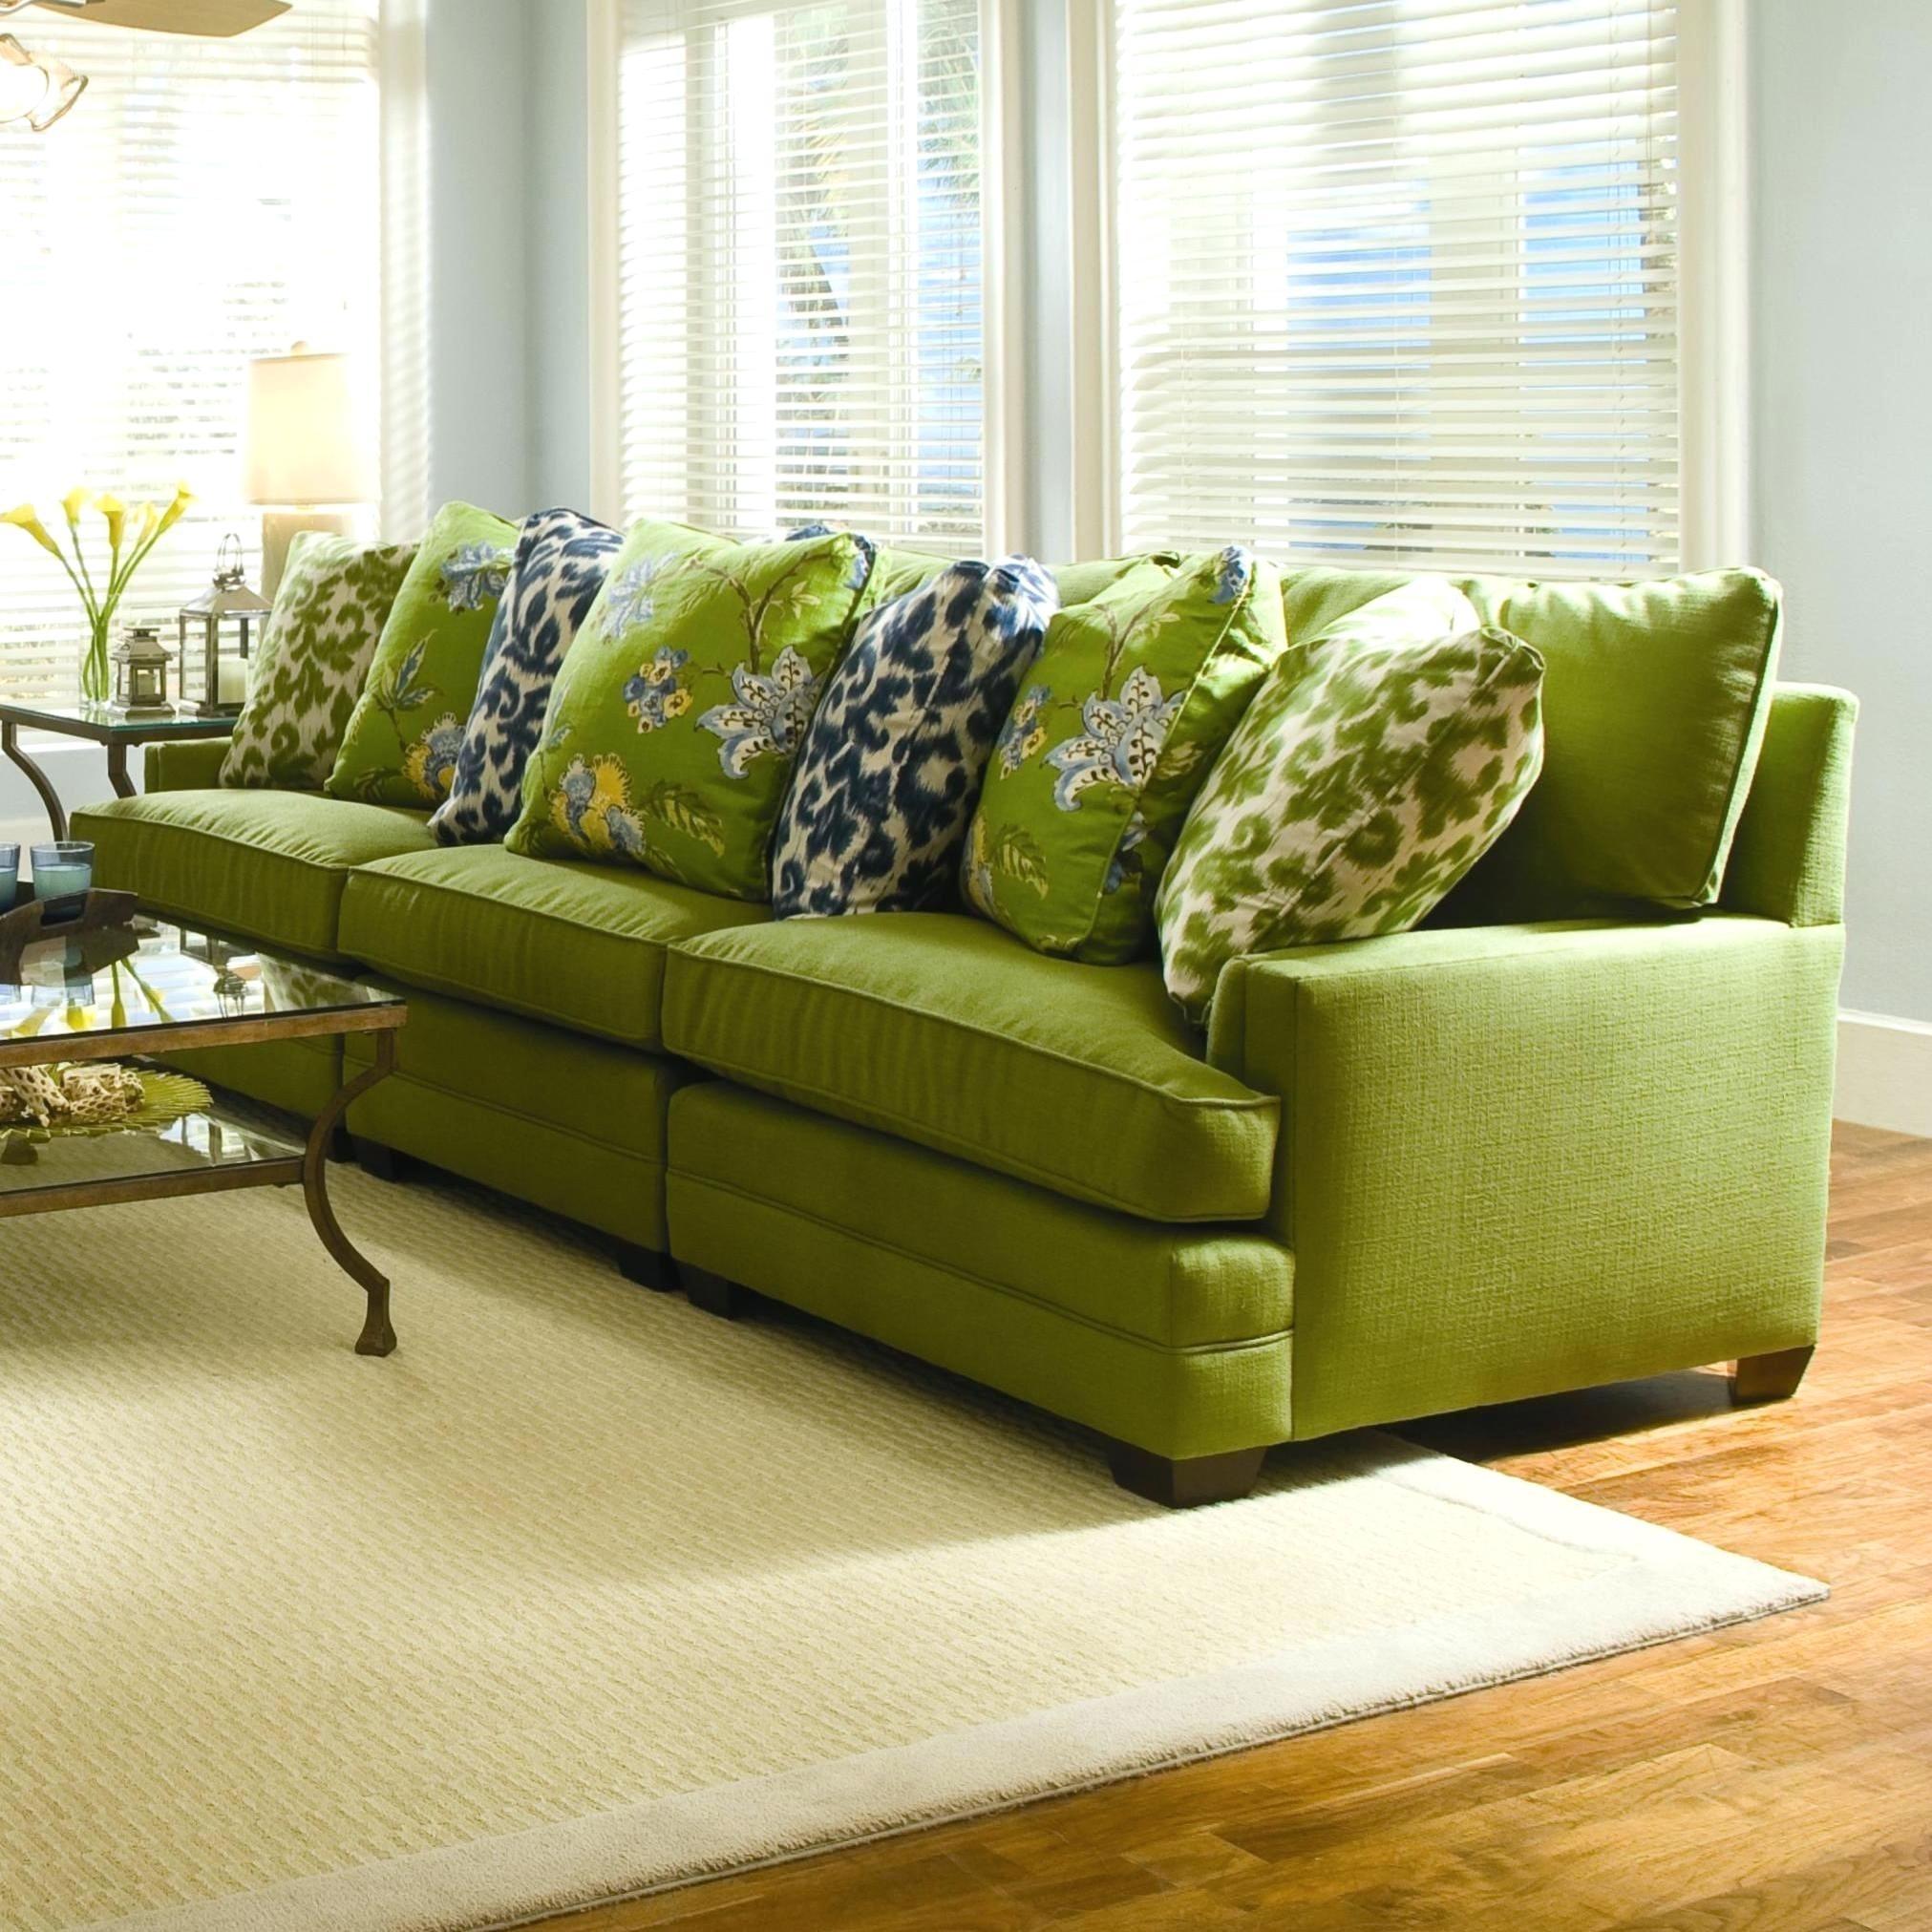 Sams Leather Sofa – Wojcicki With Regard To Sam Levitz Sectional Sofas (View 9 of 10)